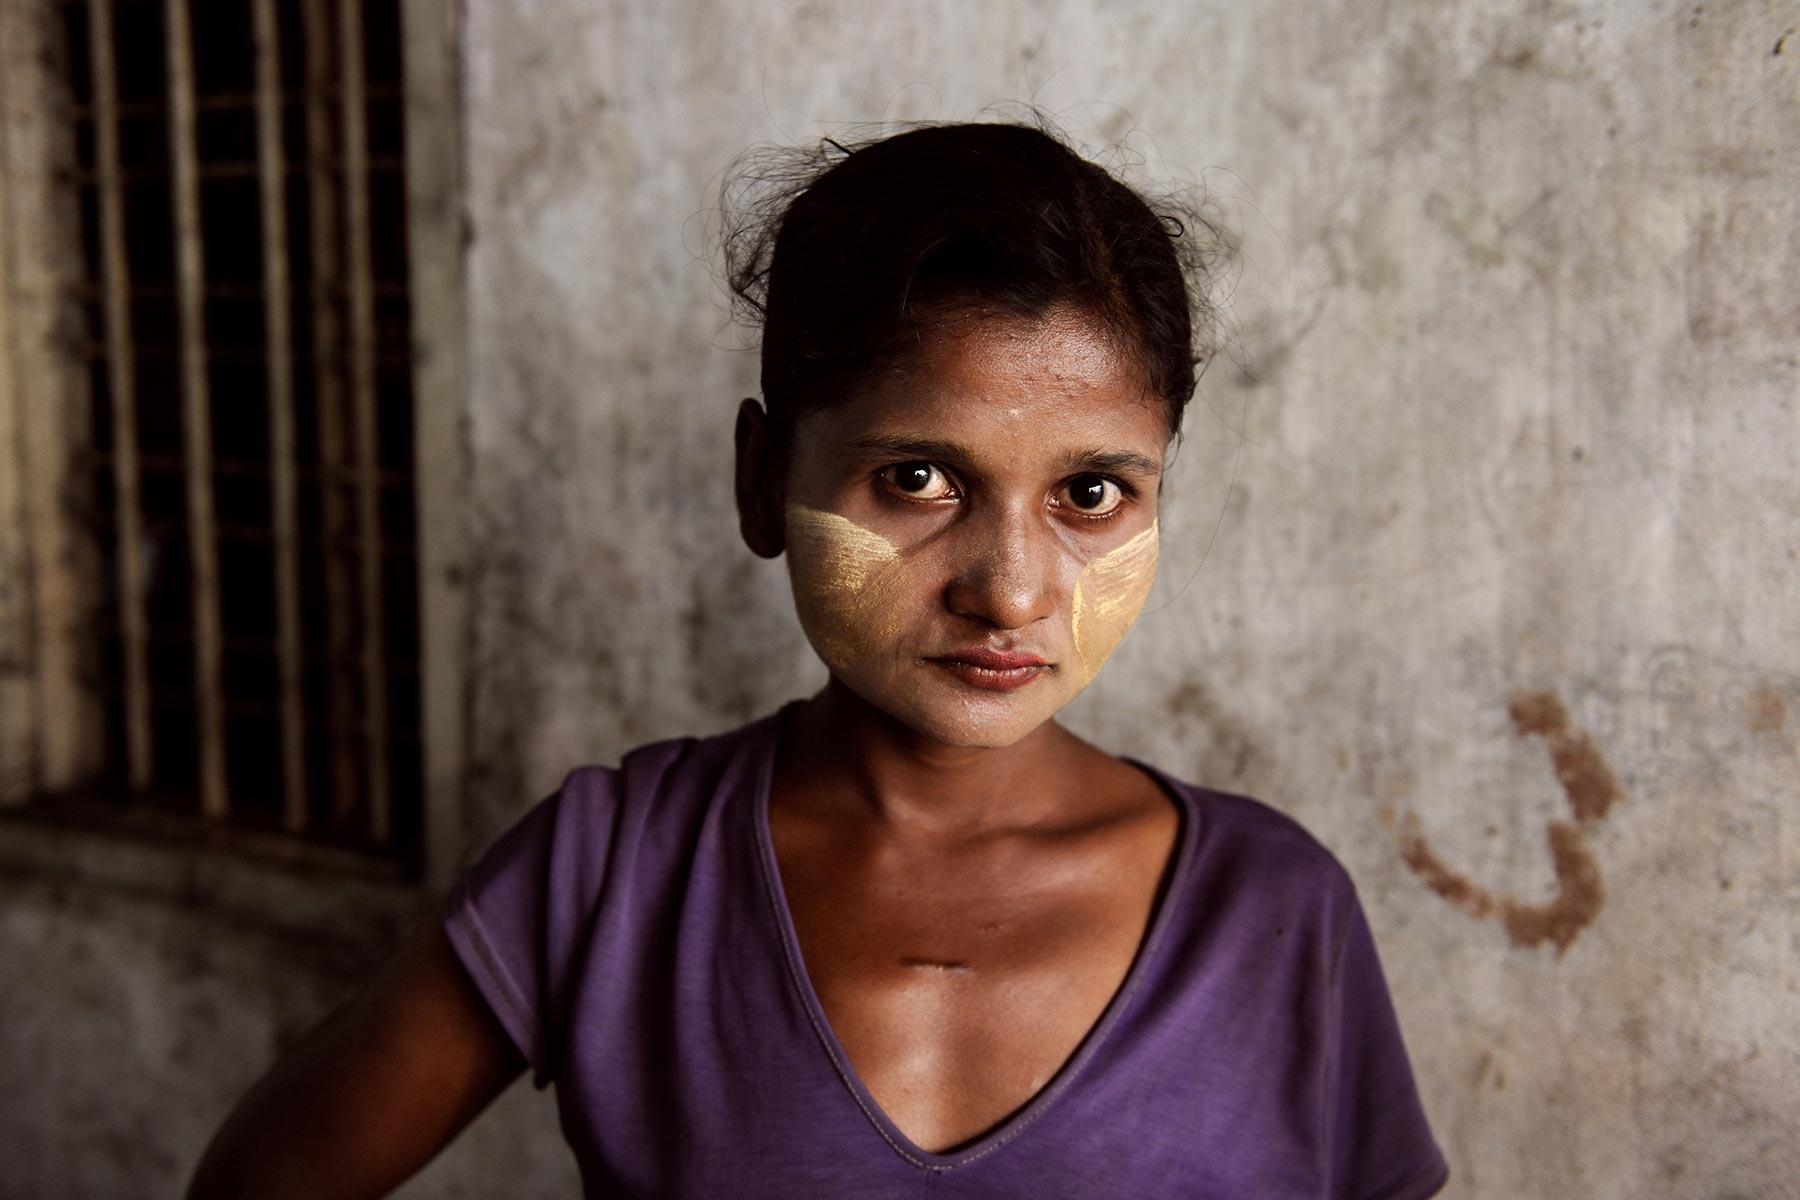 Yangon, Myanmar/Burma: https://stevemccurry.com/galleries/burma